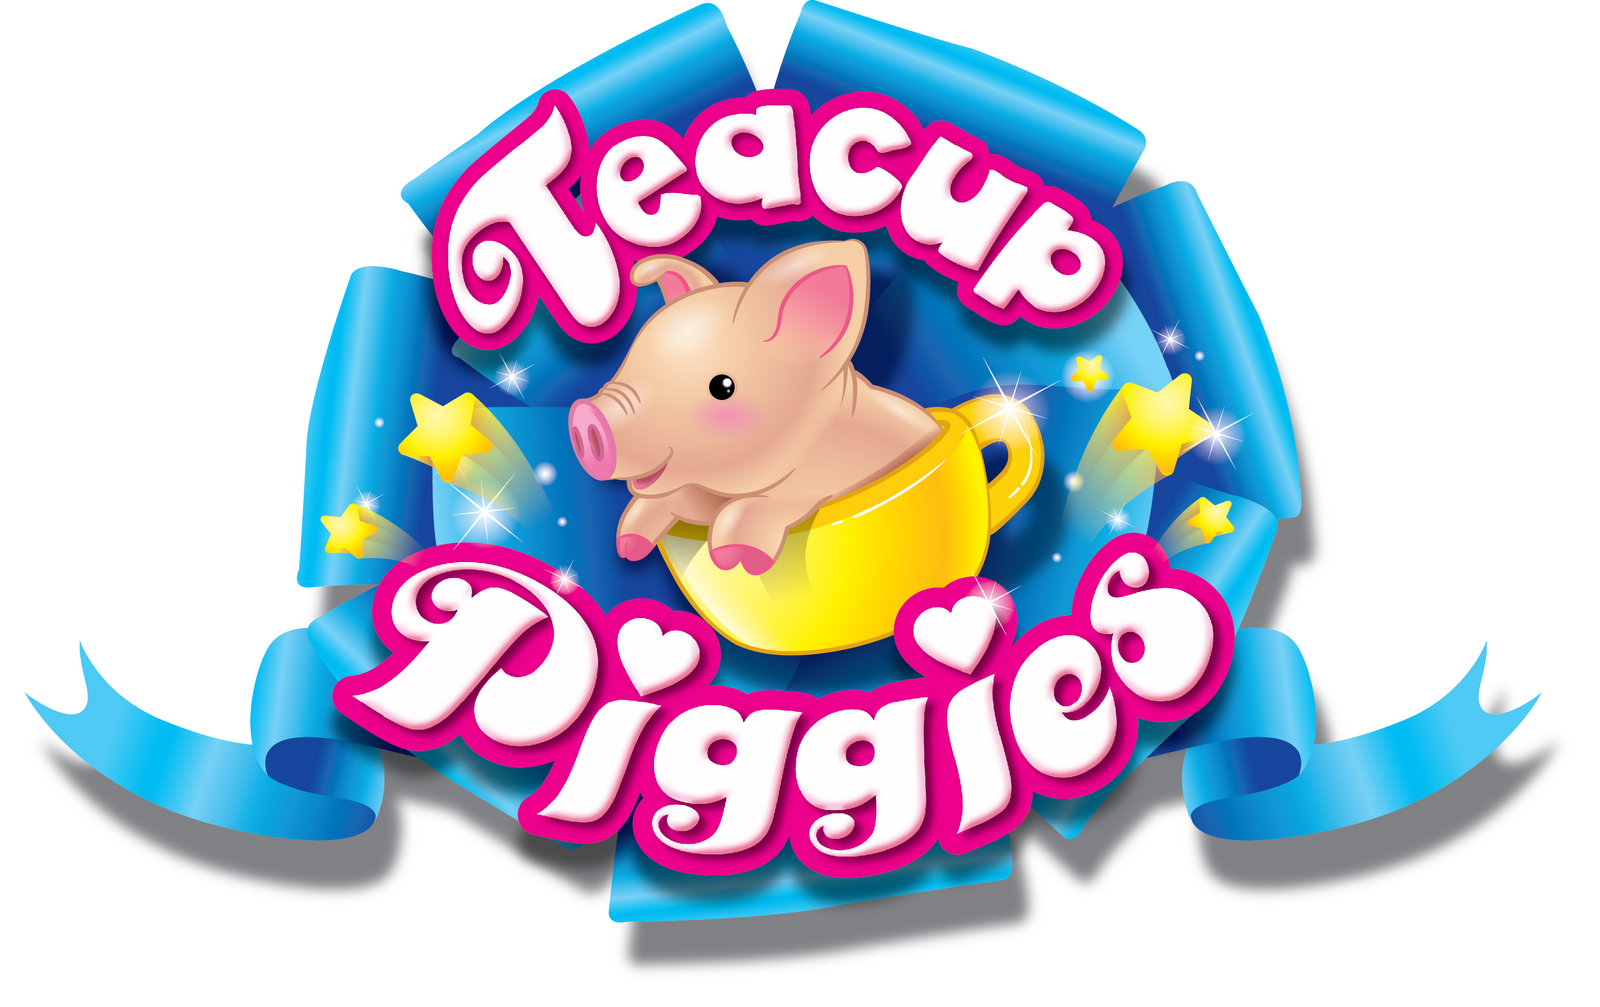 http://1.bp.blogspot.com/_sDaGNDG07Aw/TJe7tmHJz1I/AAAAAAAADgI/un8MvNRR61I/s1600/teacup+piggies+logo.jpg